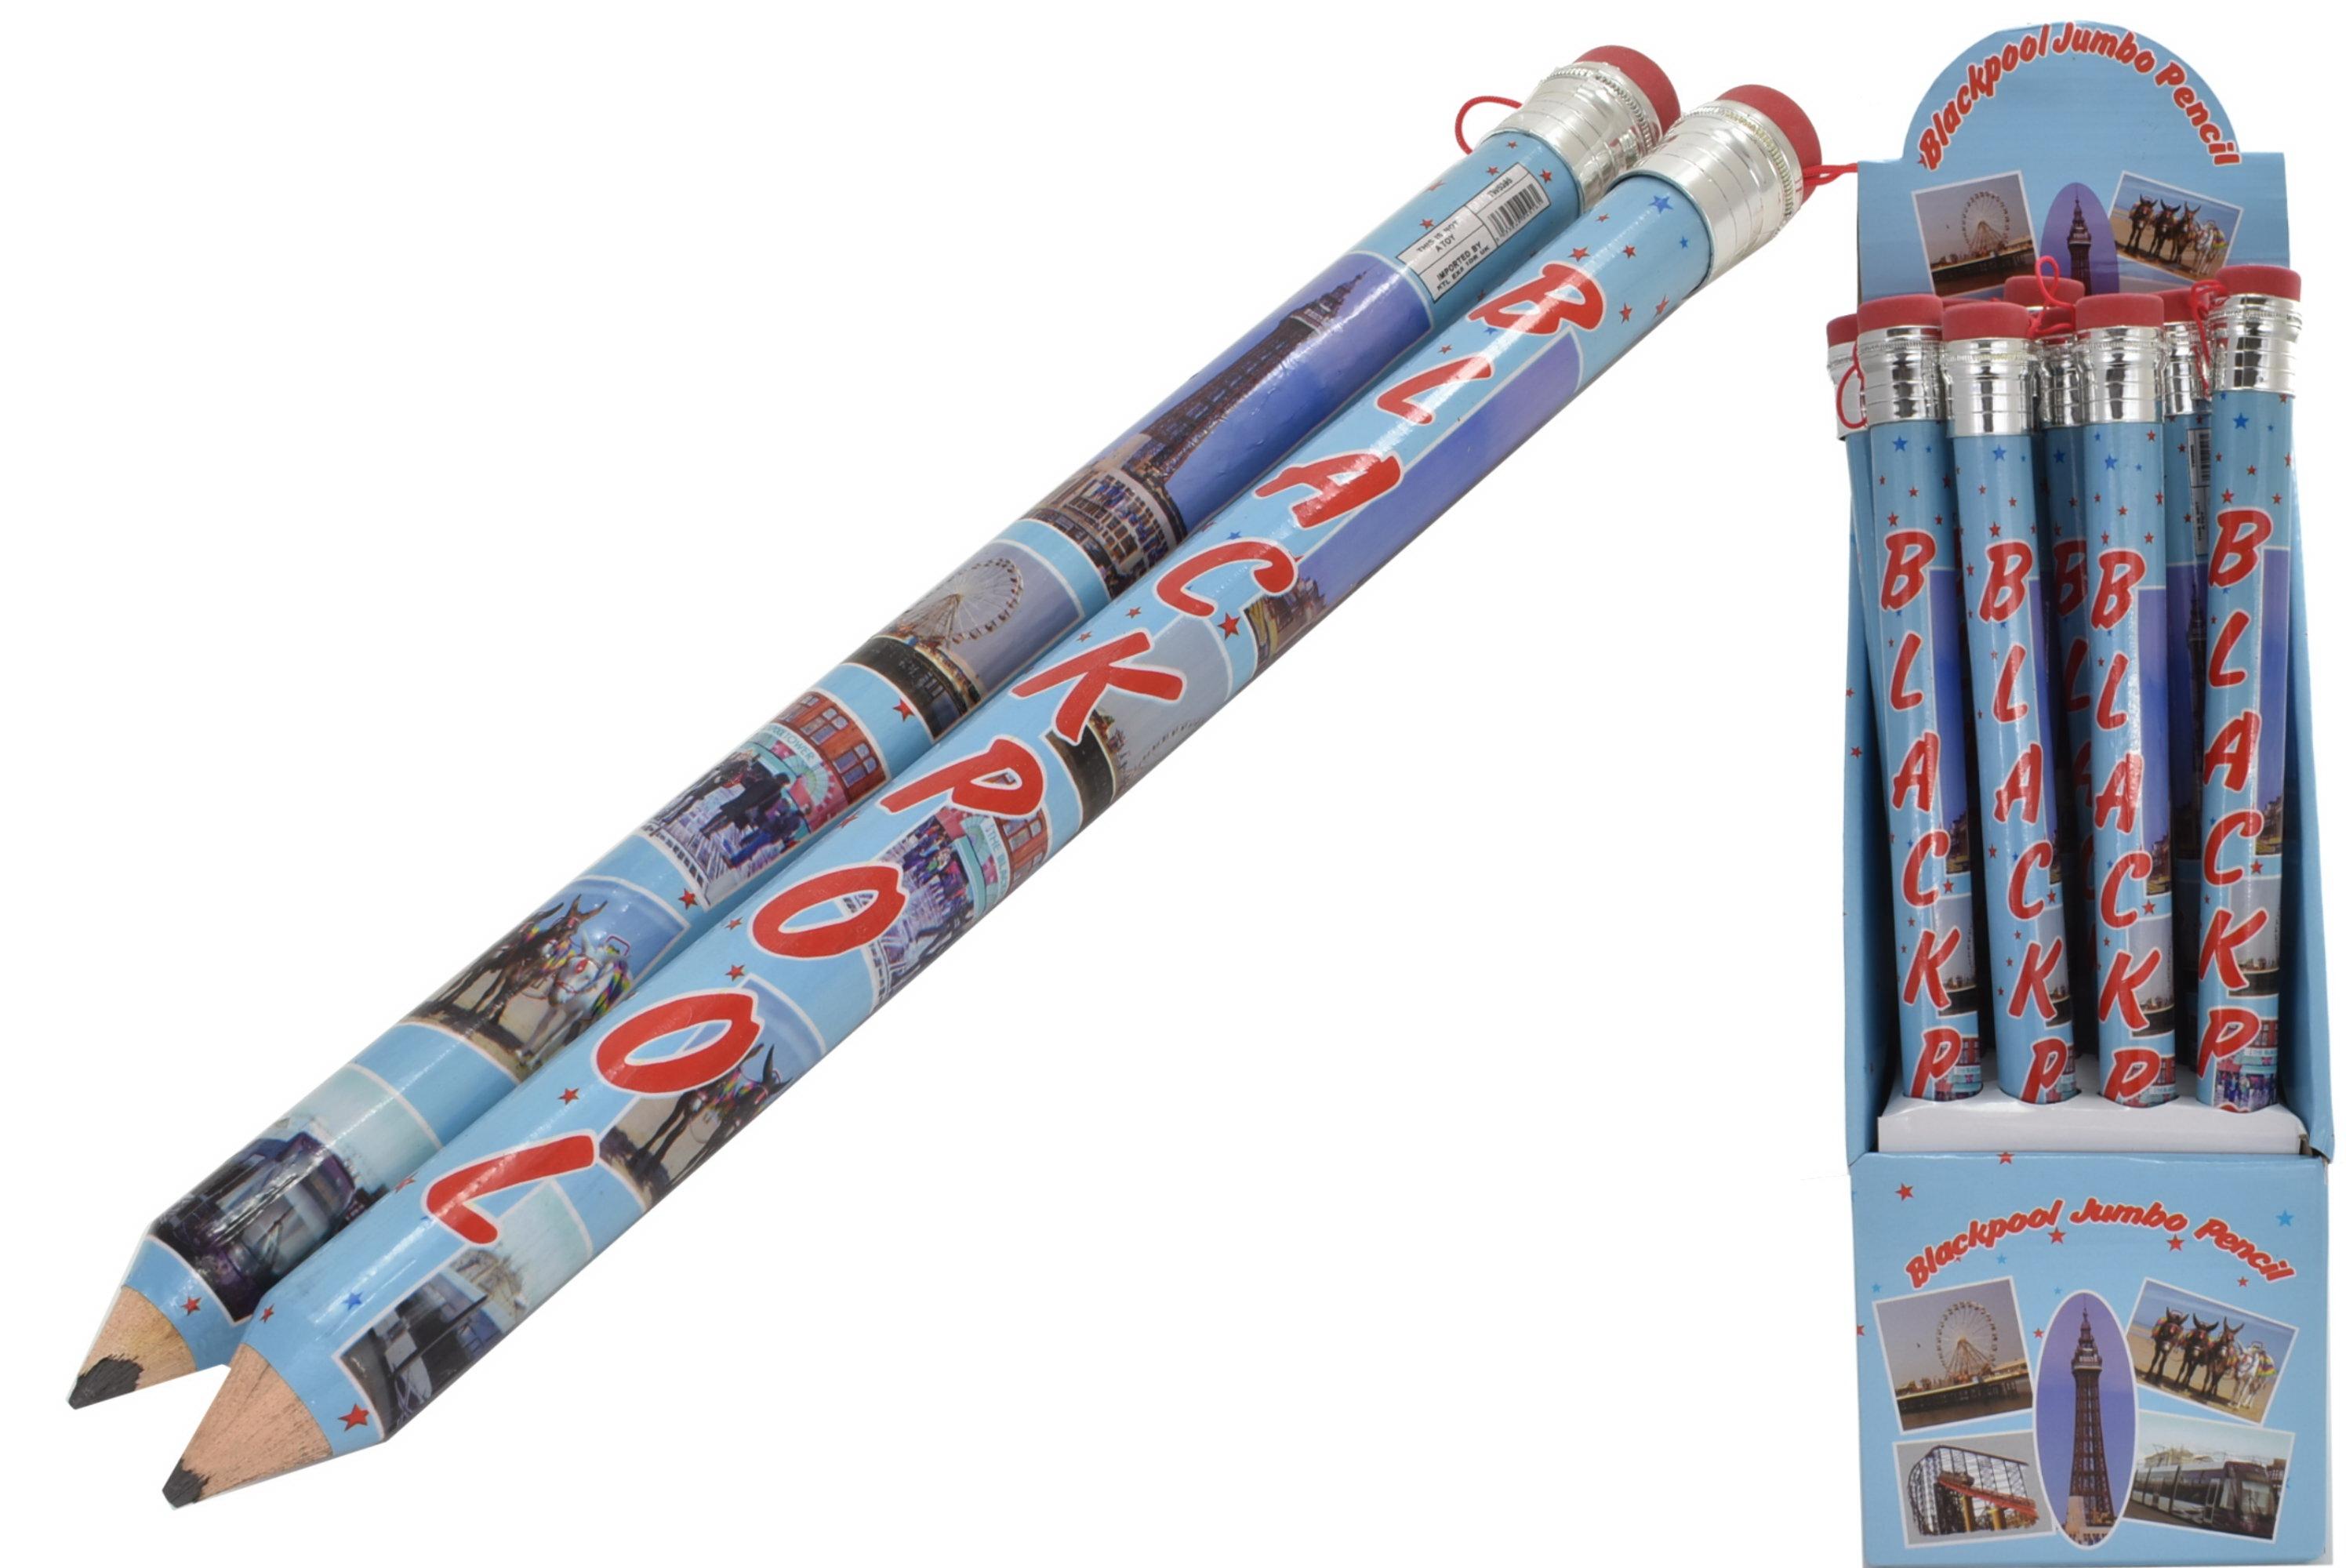 Blackpool Jumbo Pencil In Display